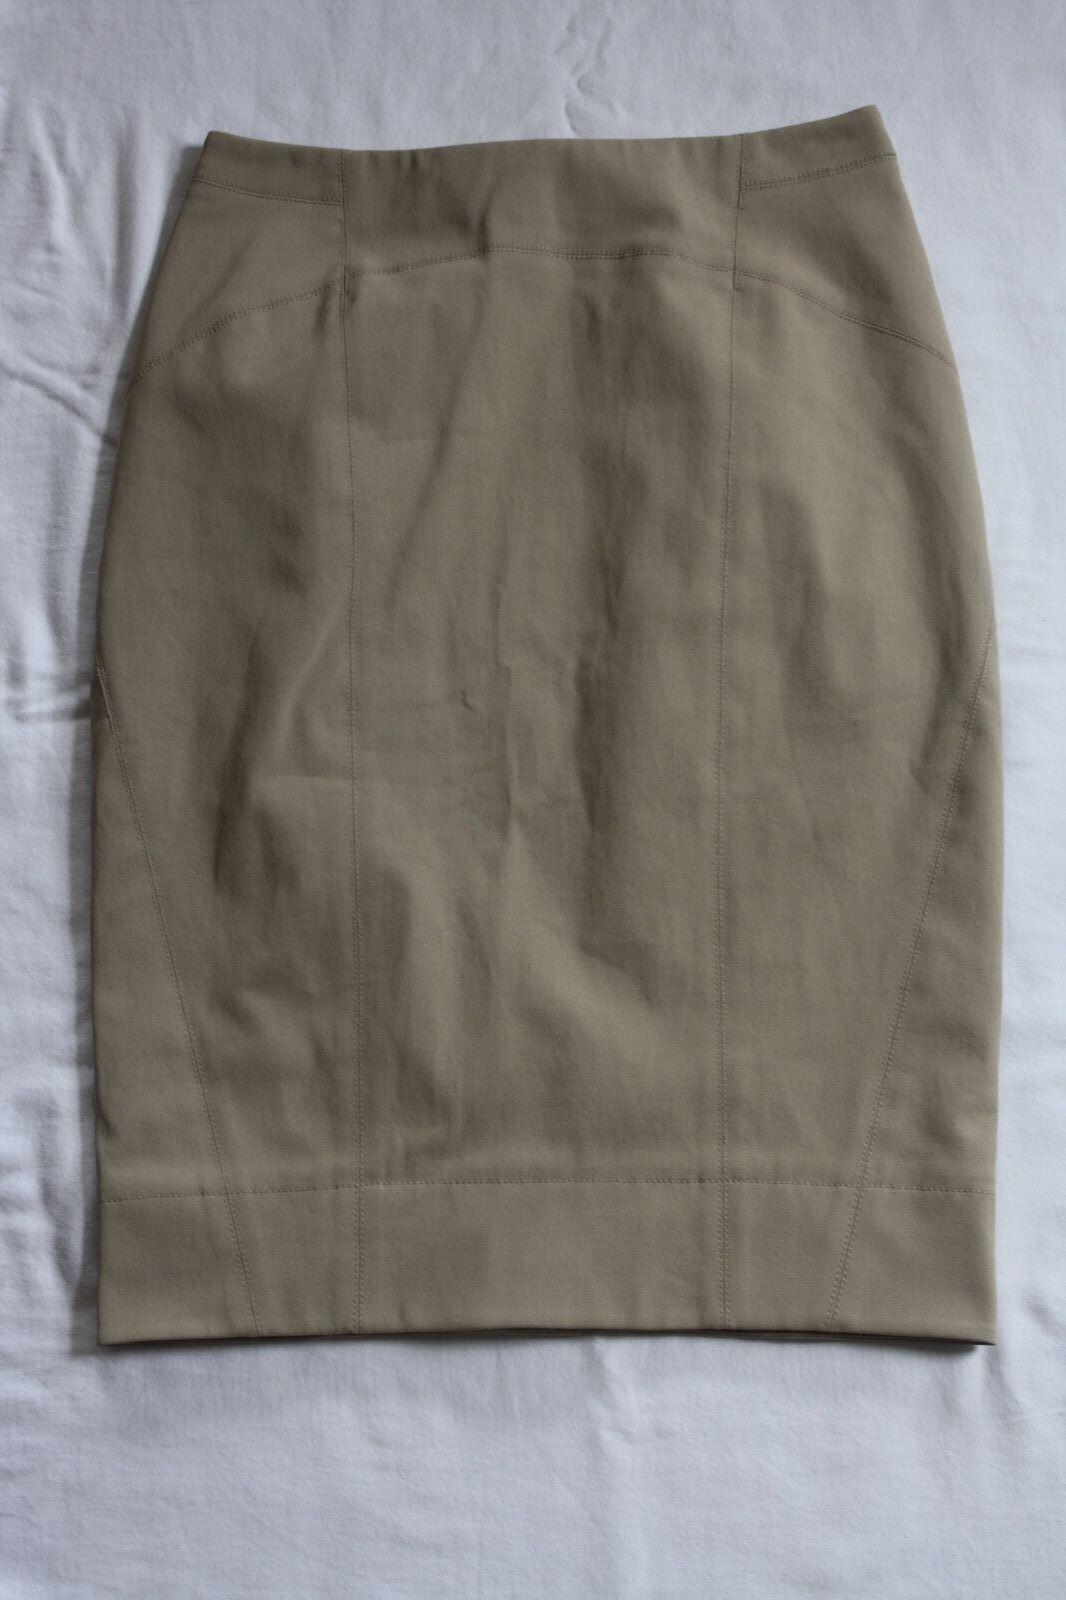 KaufmanFranco Beige Long Pencil Skirt Sz 40   4 Paneling Seam Details Zipper